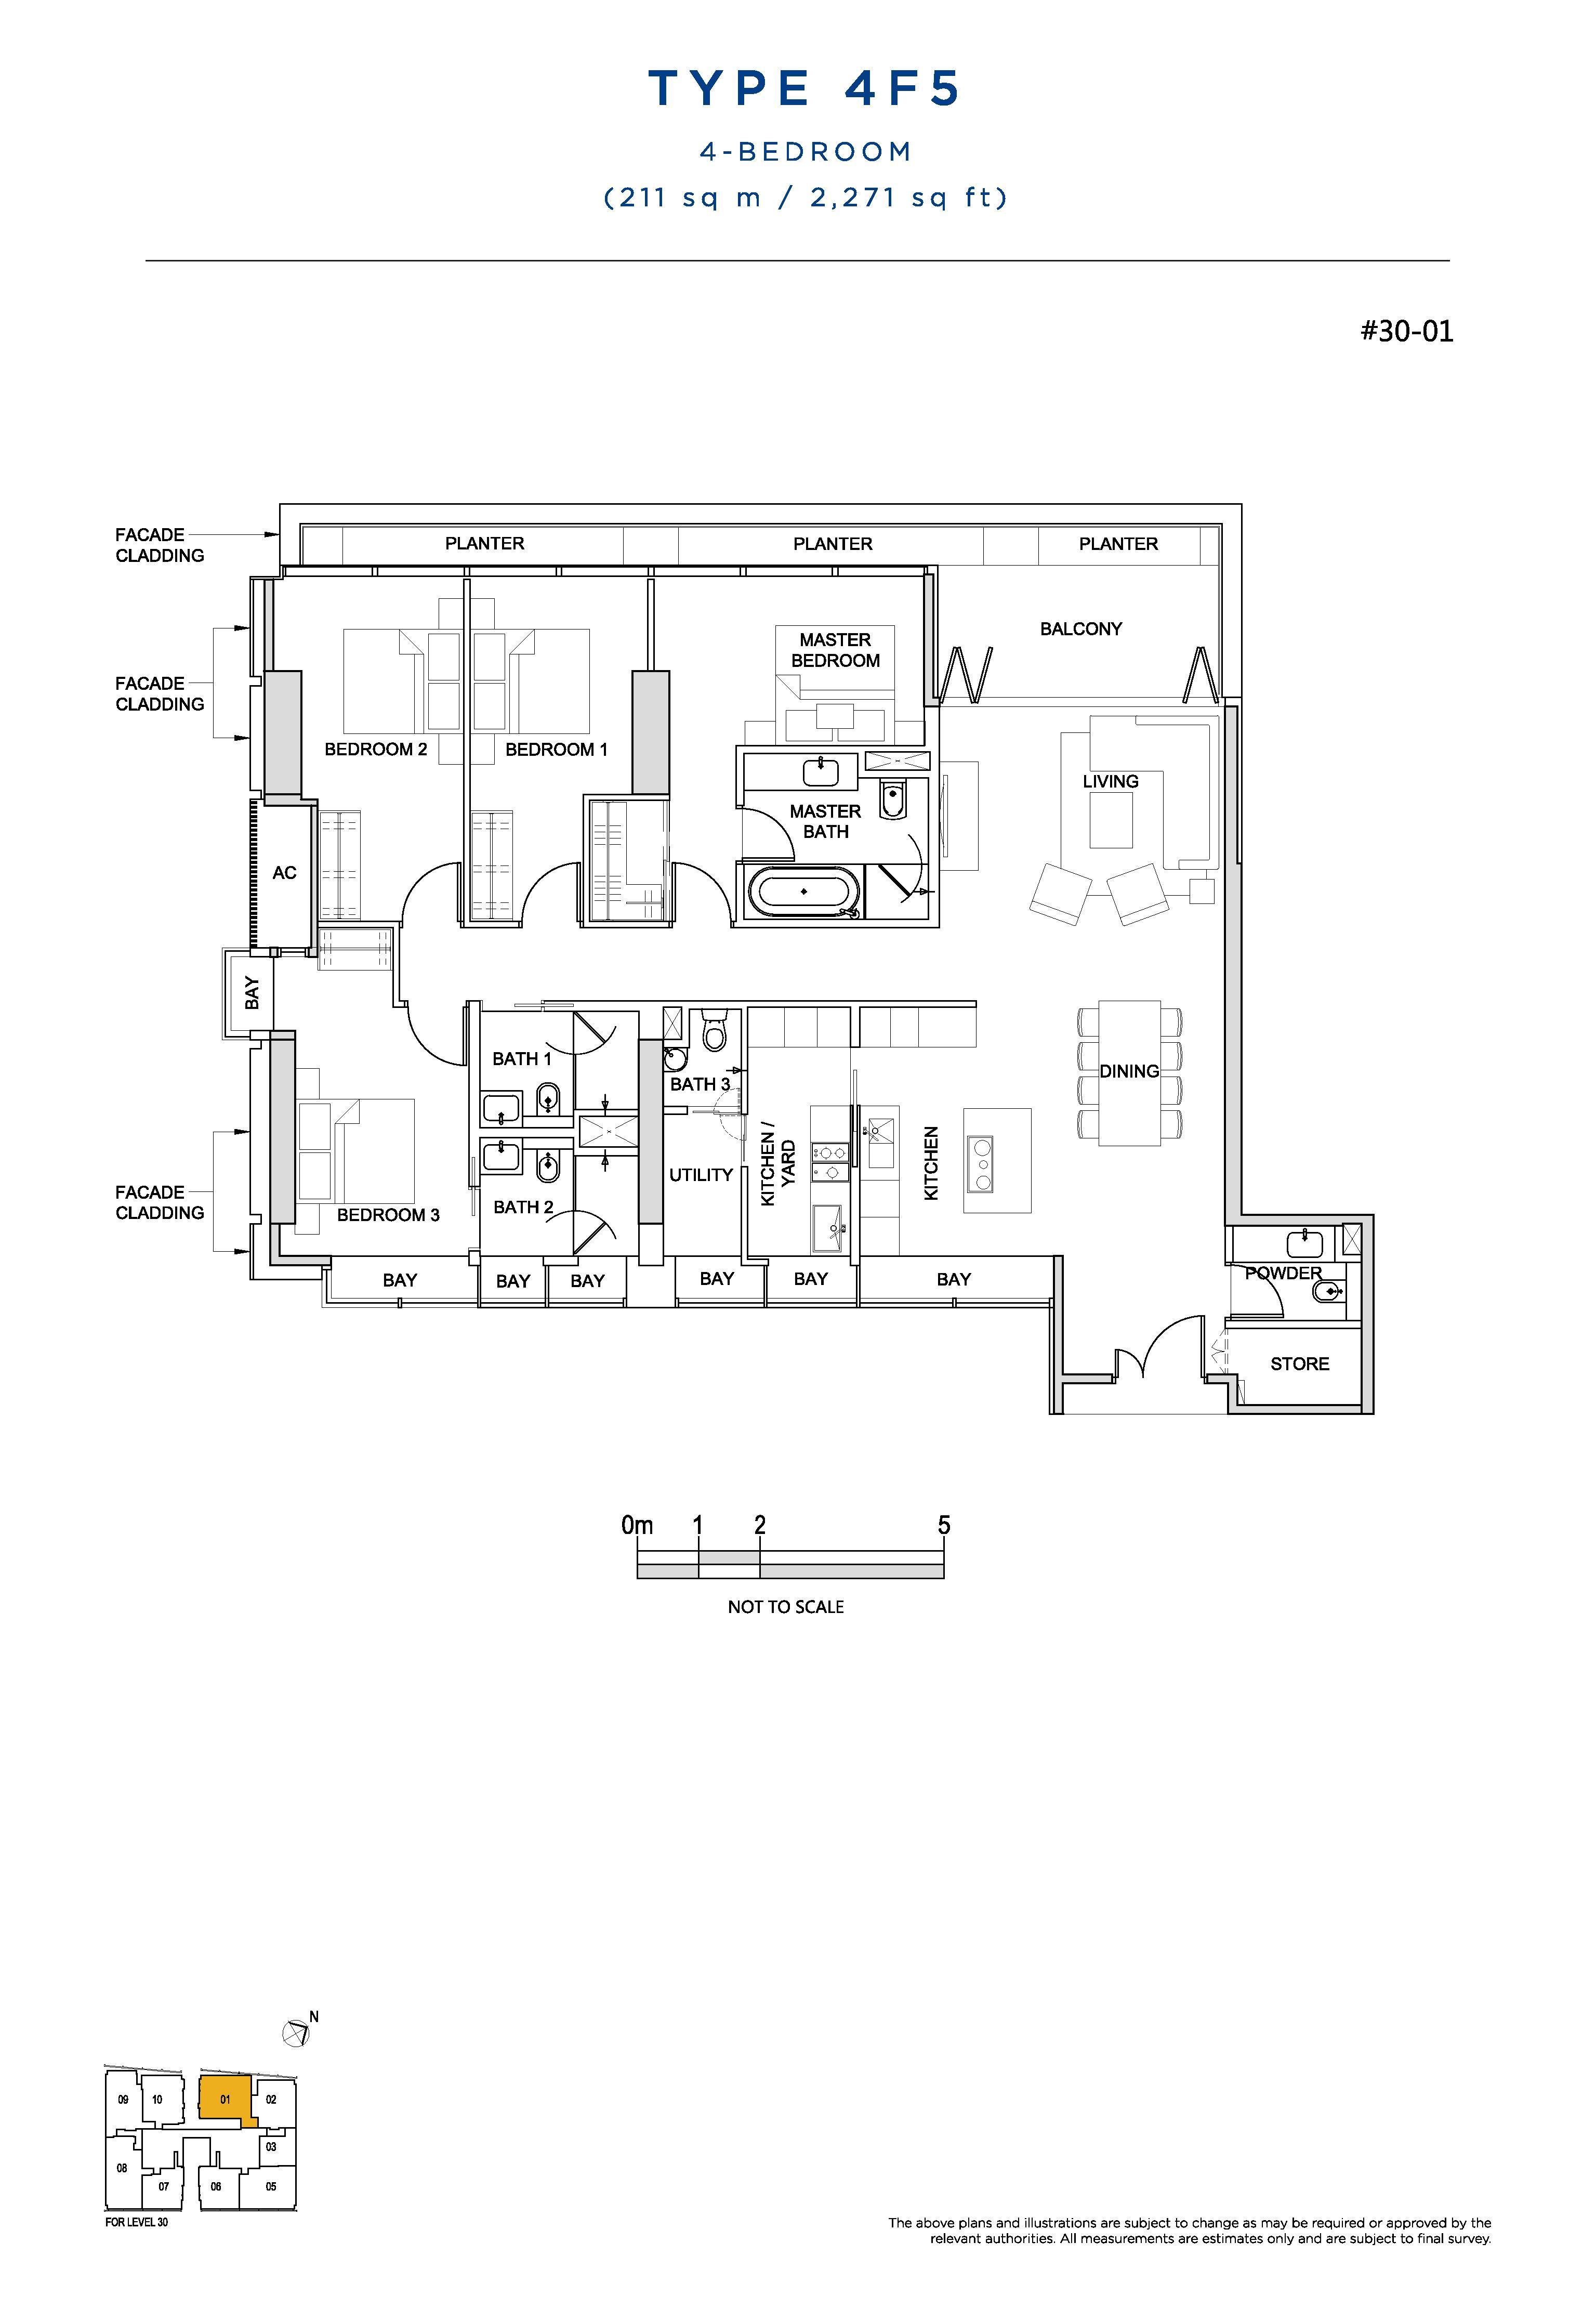 South Beach Residences 4 Bedroom Floor Plans Type 4F5